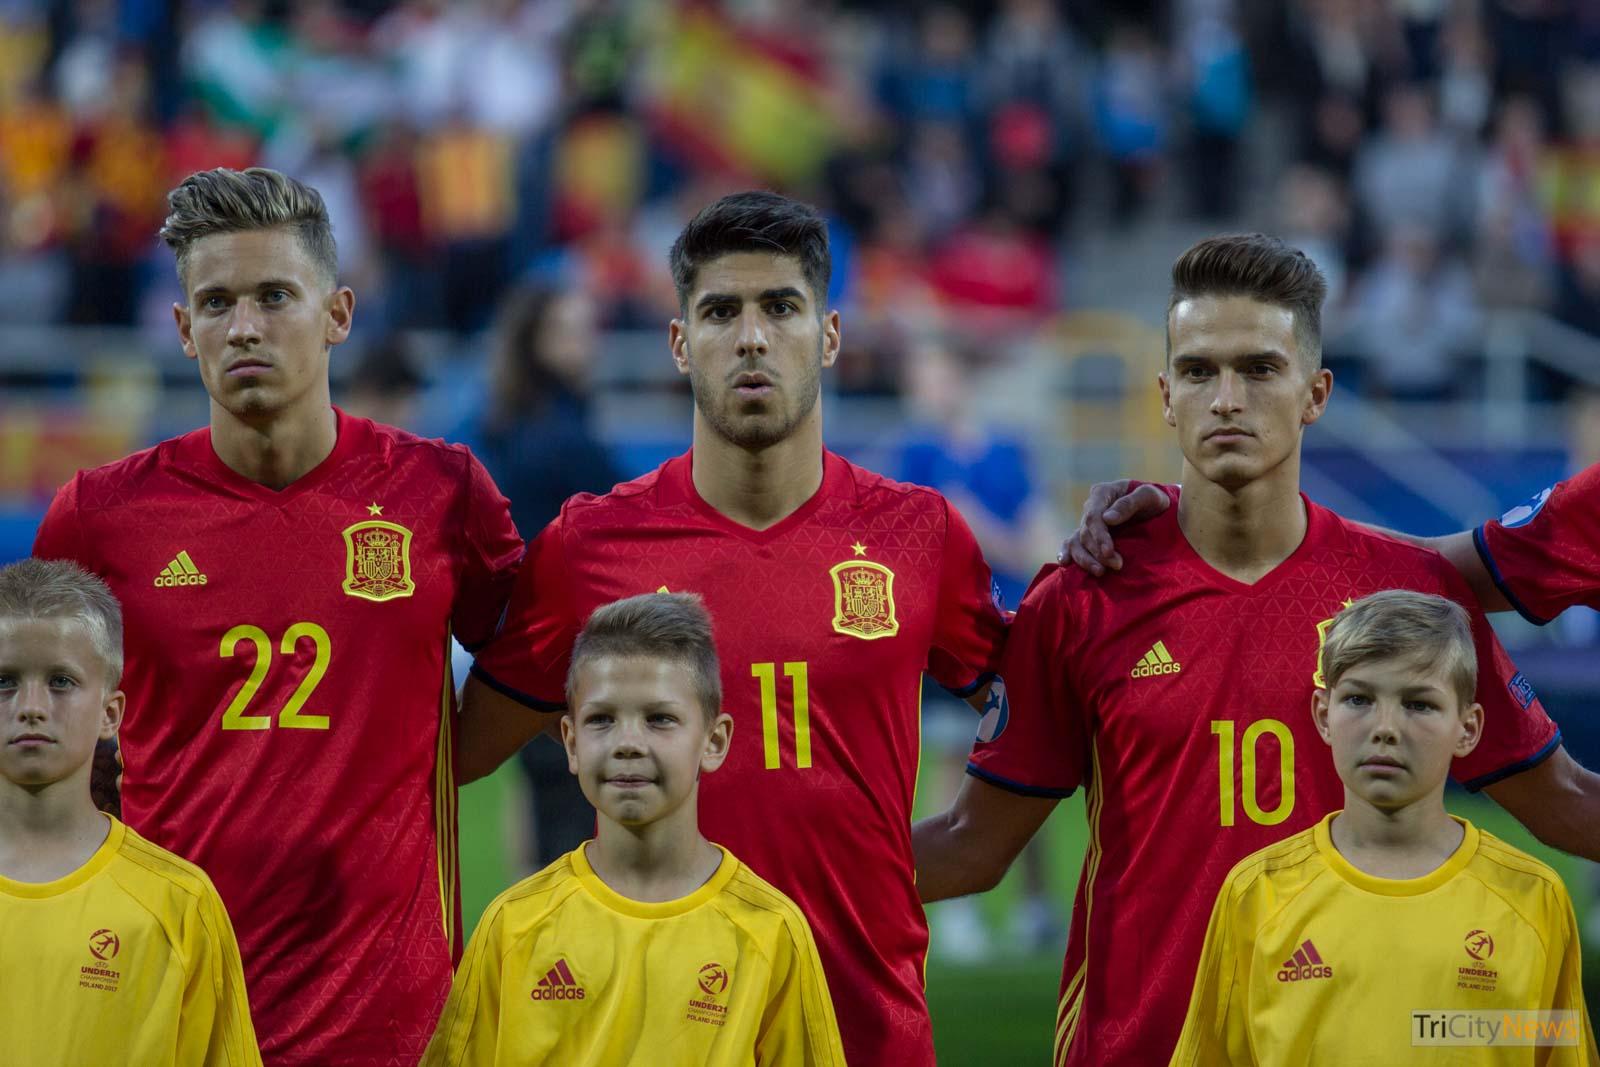 UEFA U21 European Championship Photo: Jakub Wozniak/Tricity News